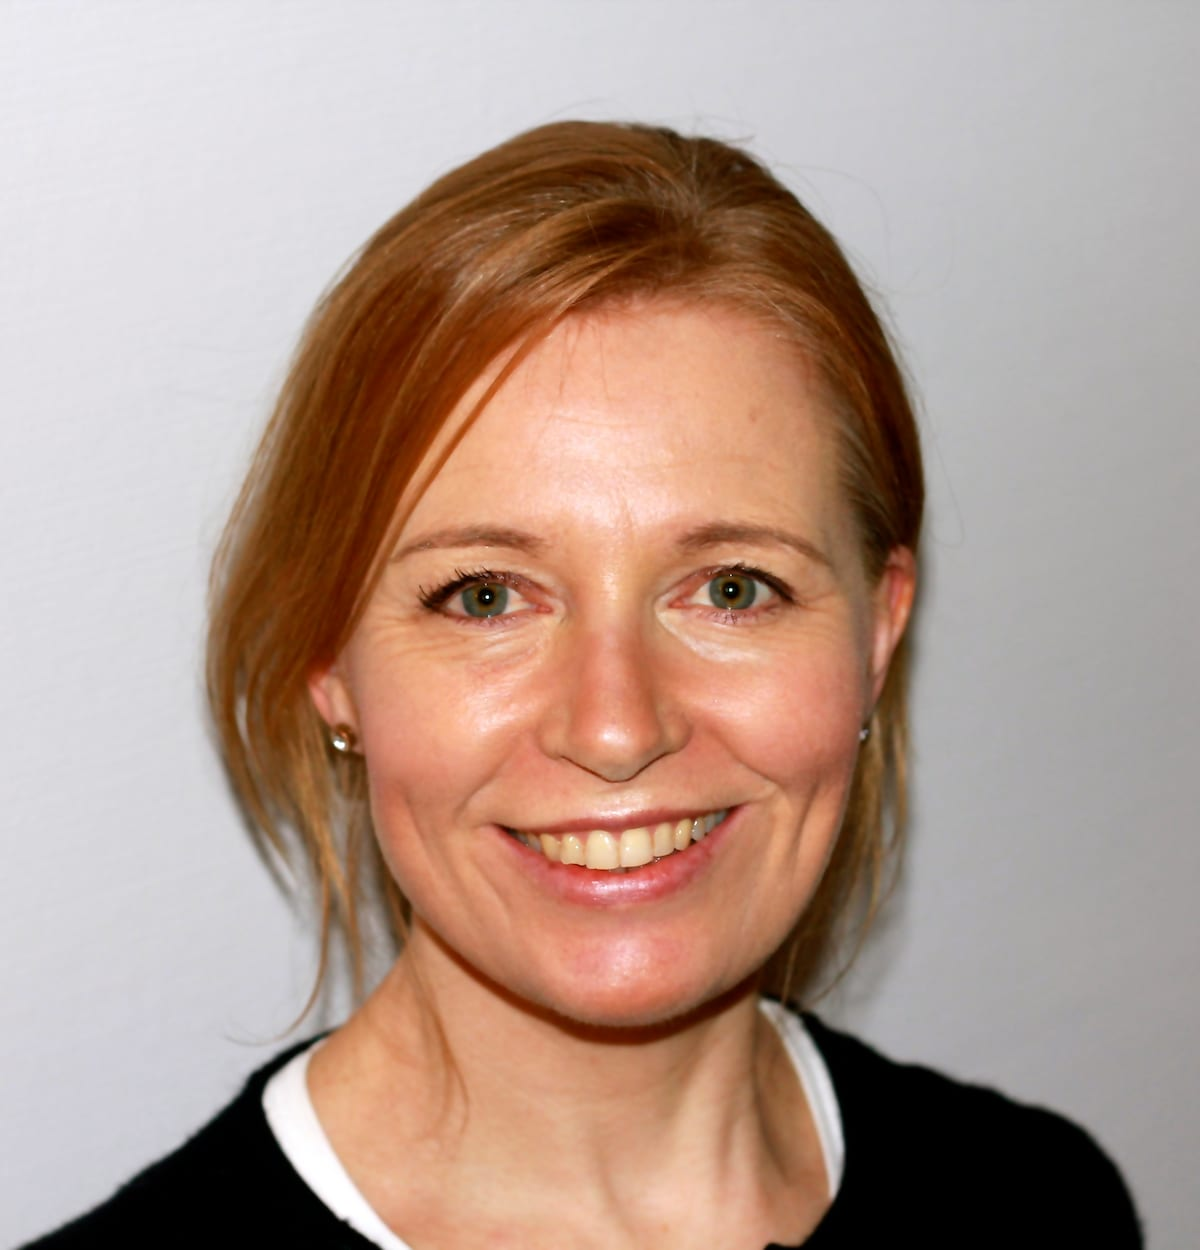 Elisabeth from Tyinkrysset